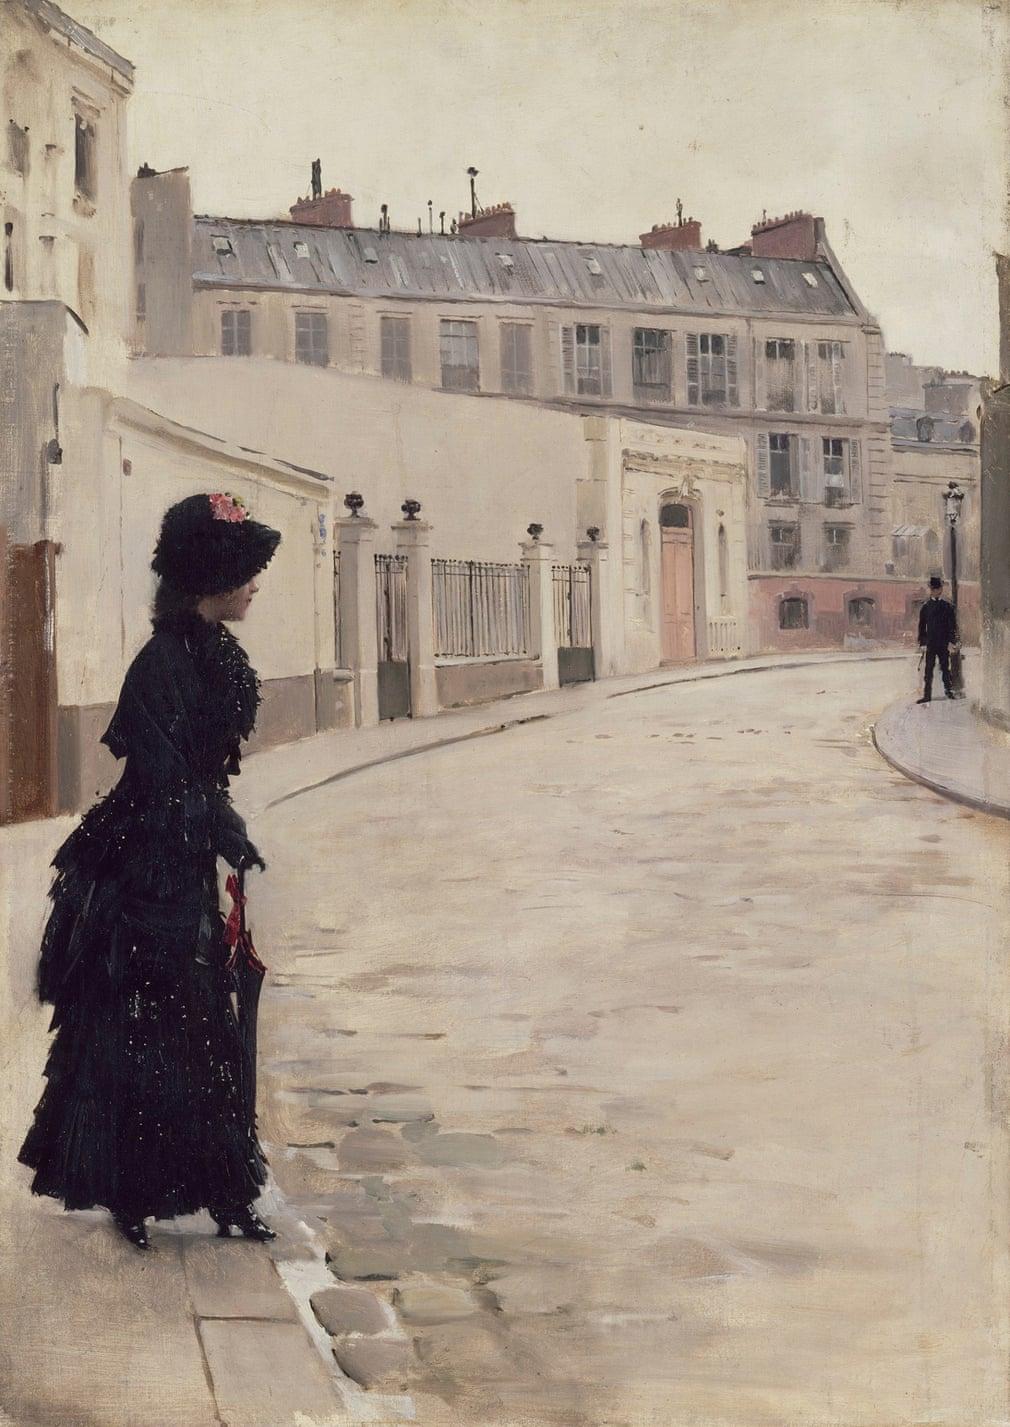 Jean Béraud: L'Attente, 1880